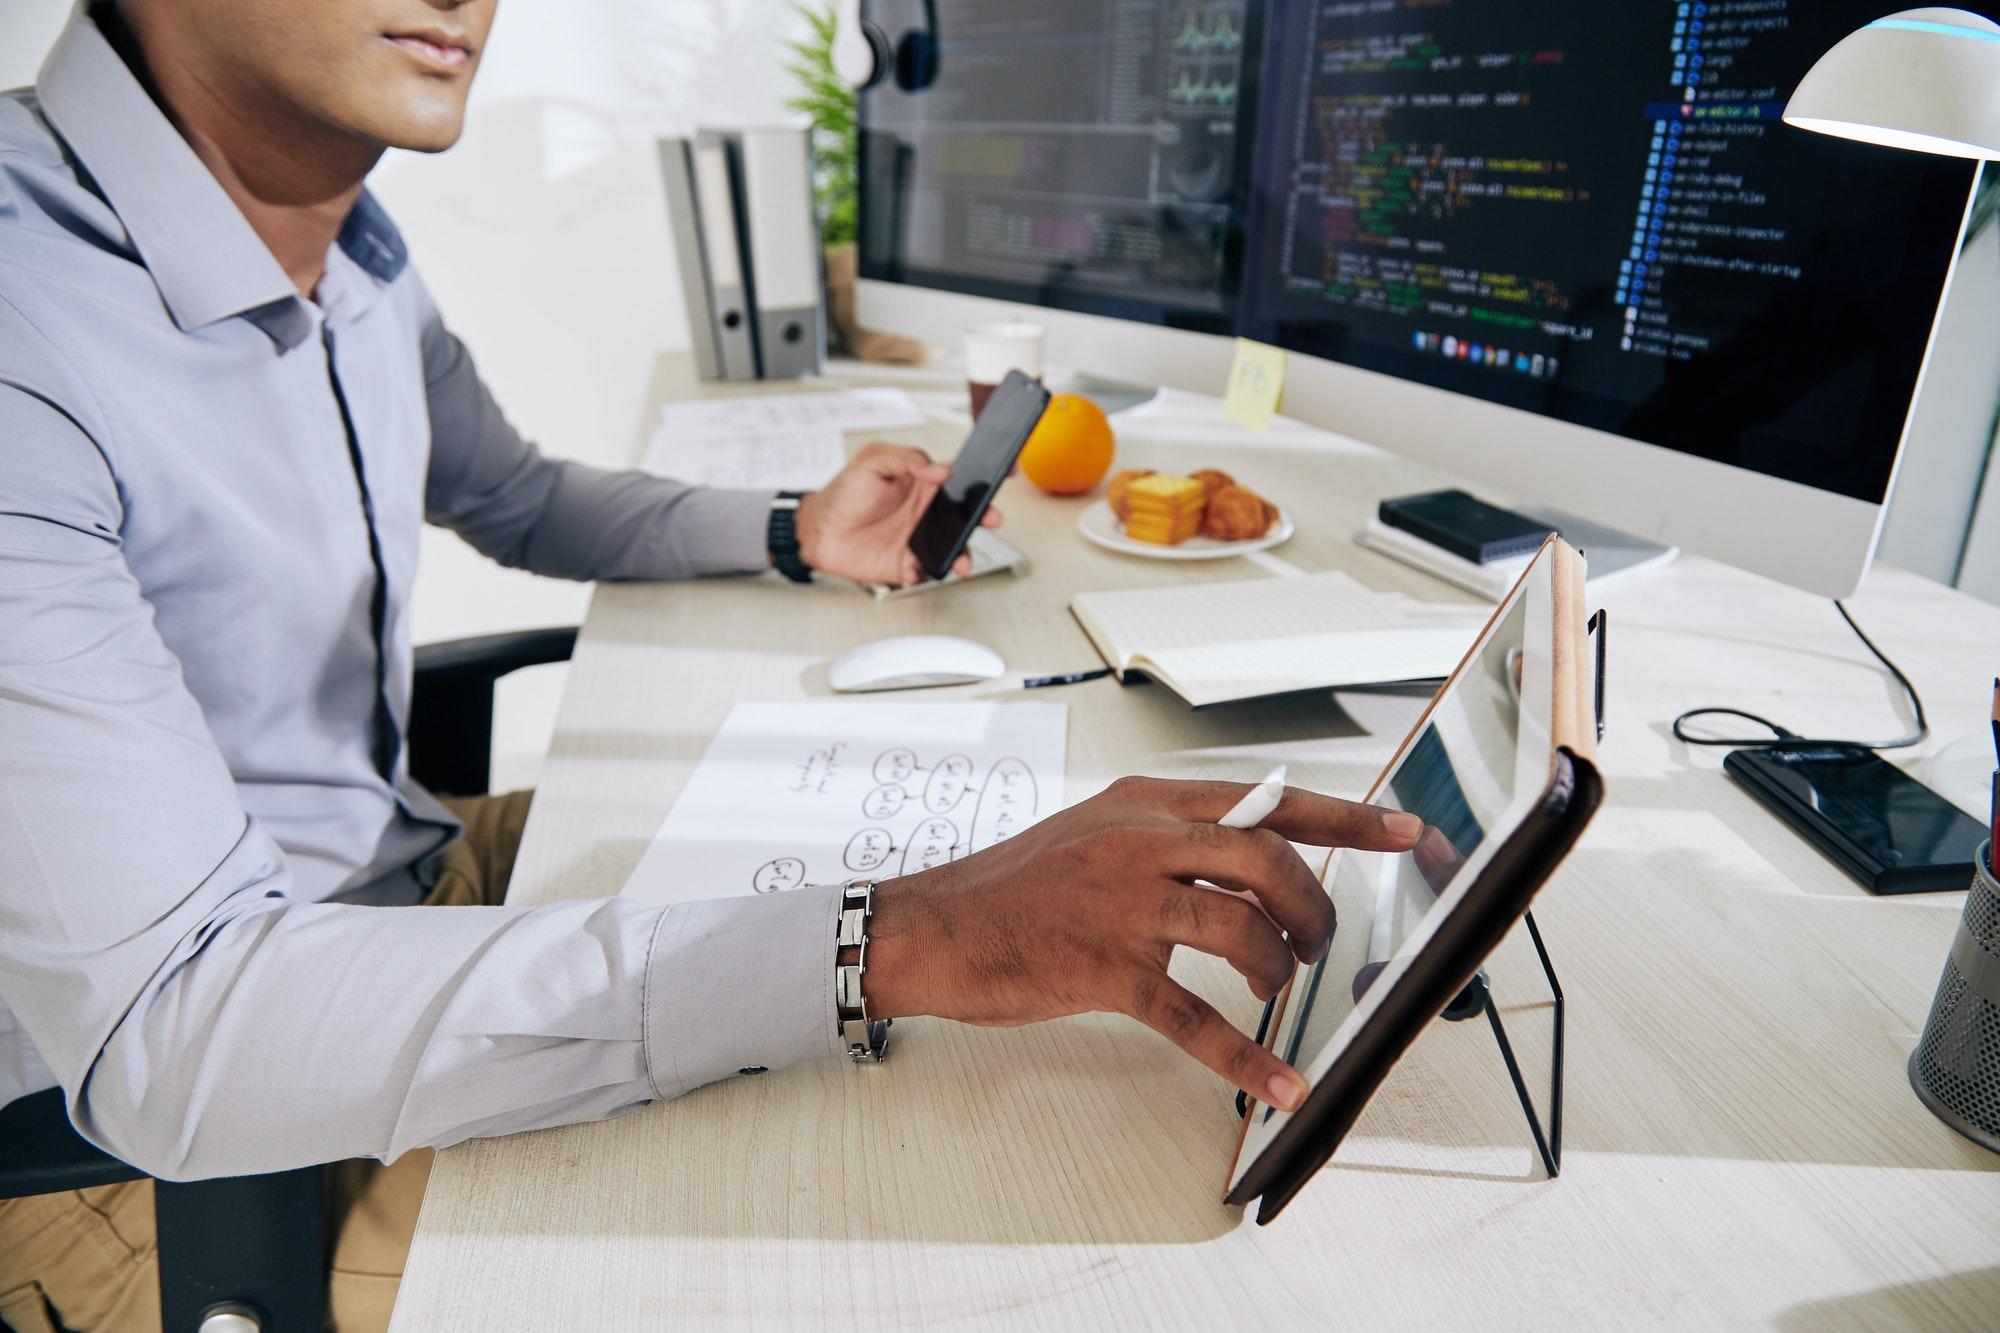 Software developer checking data